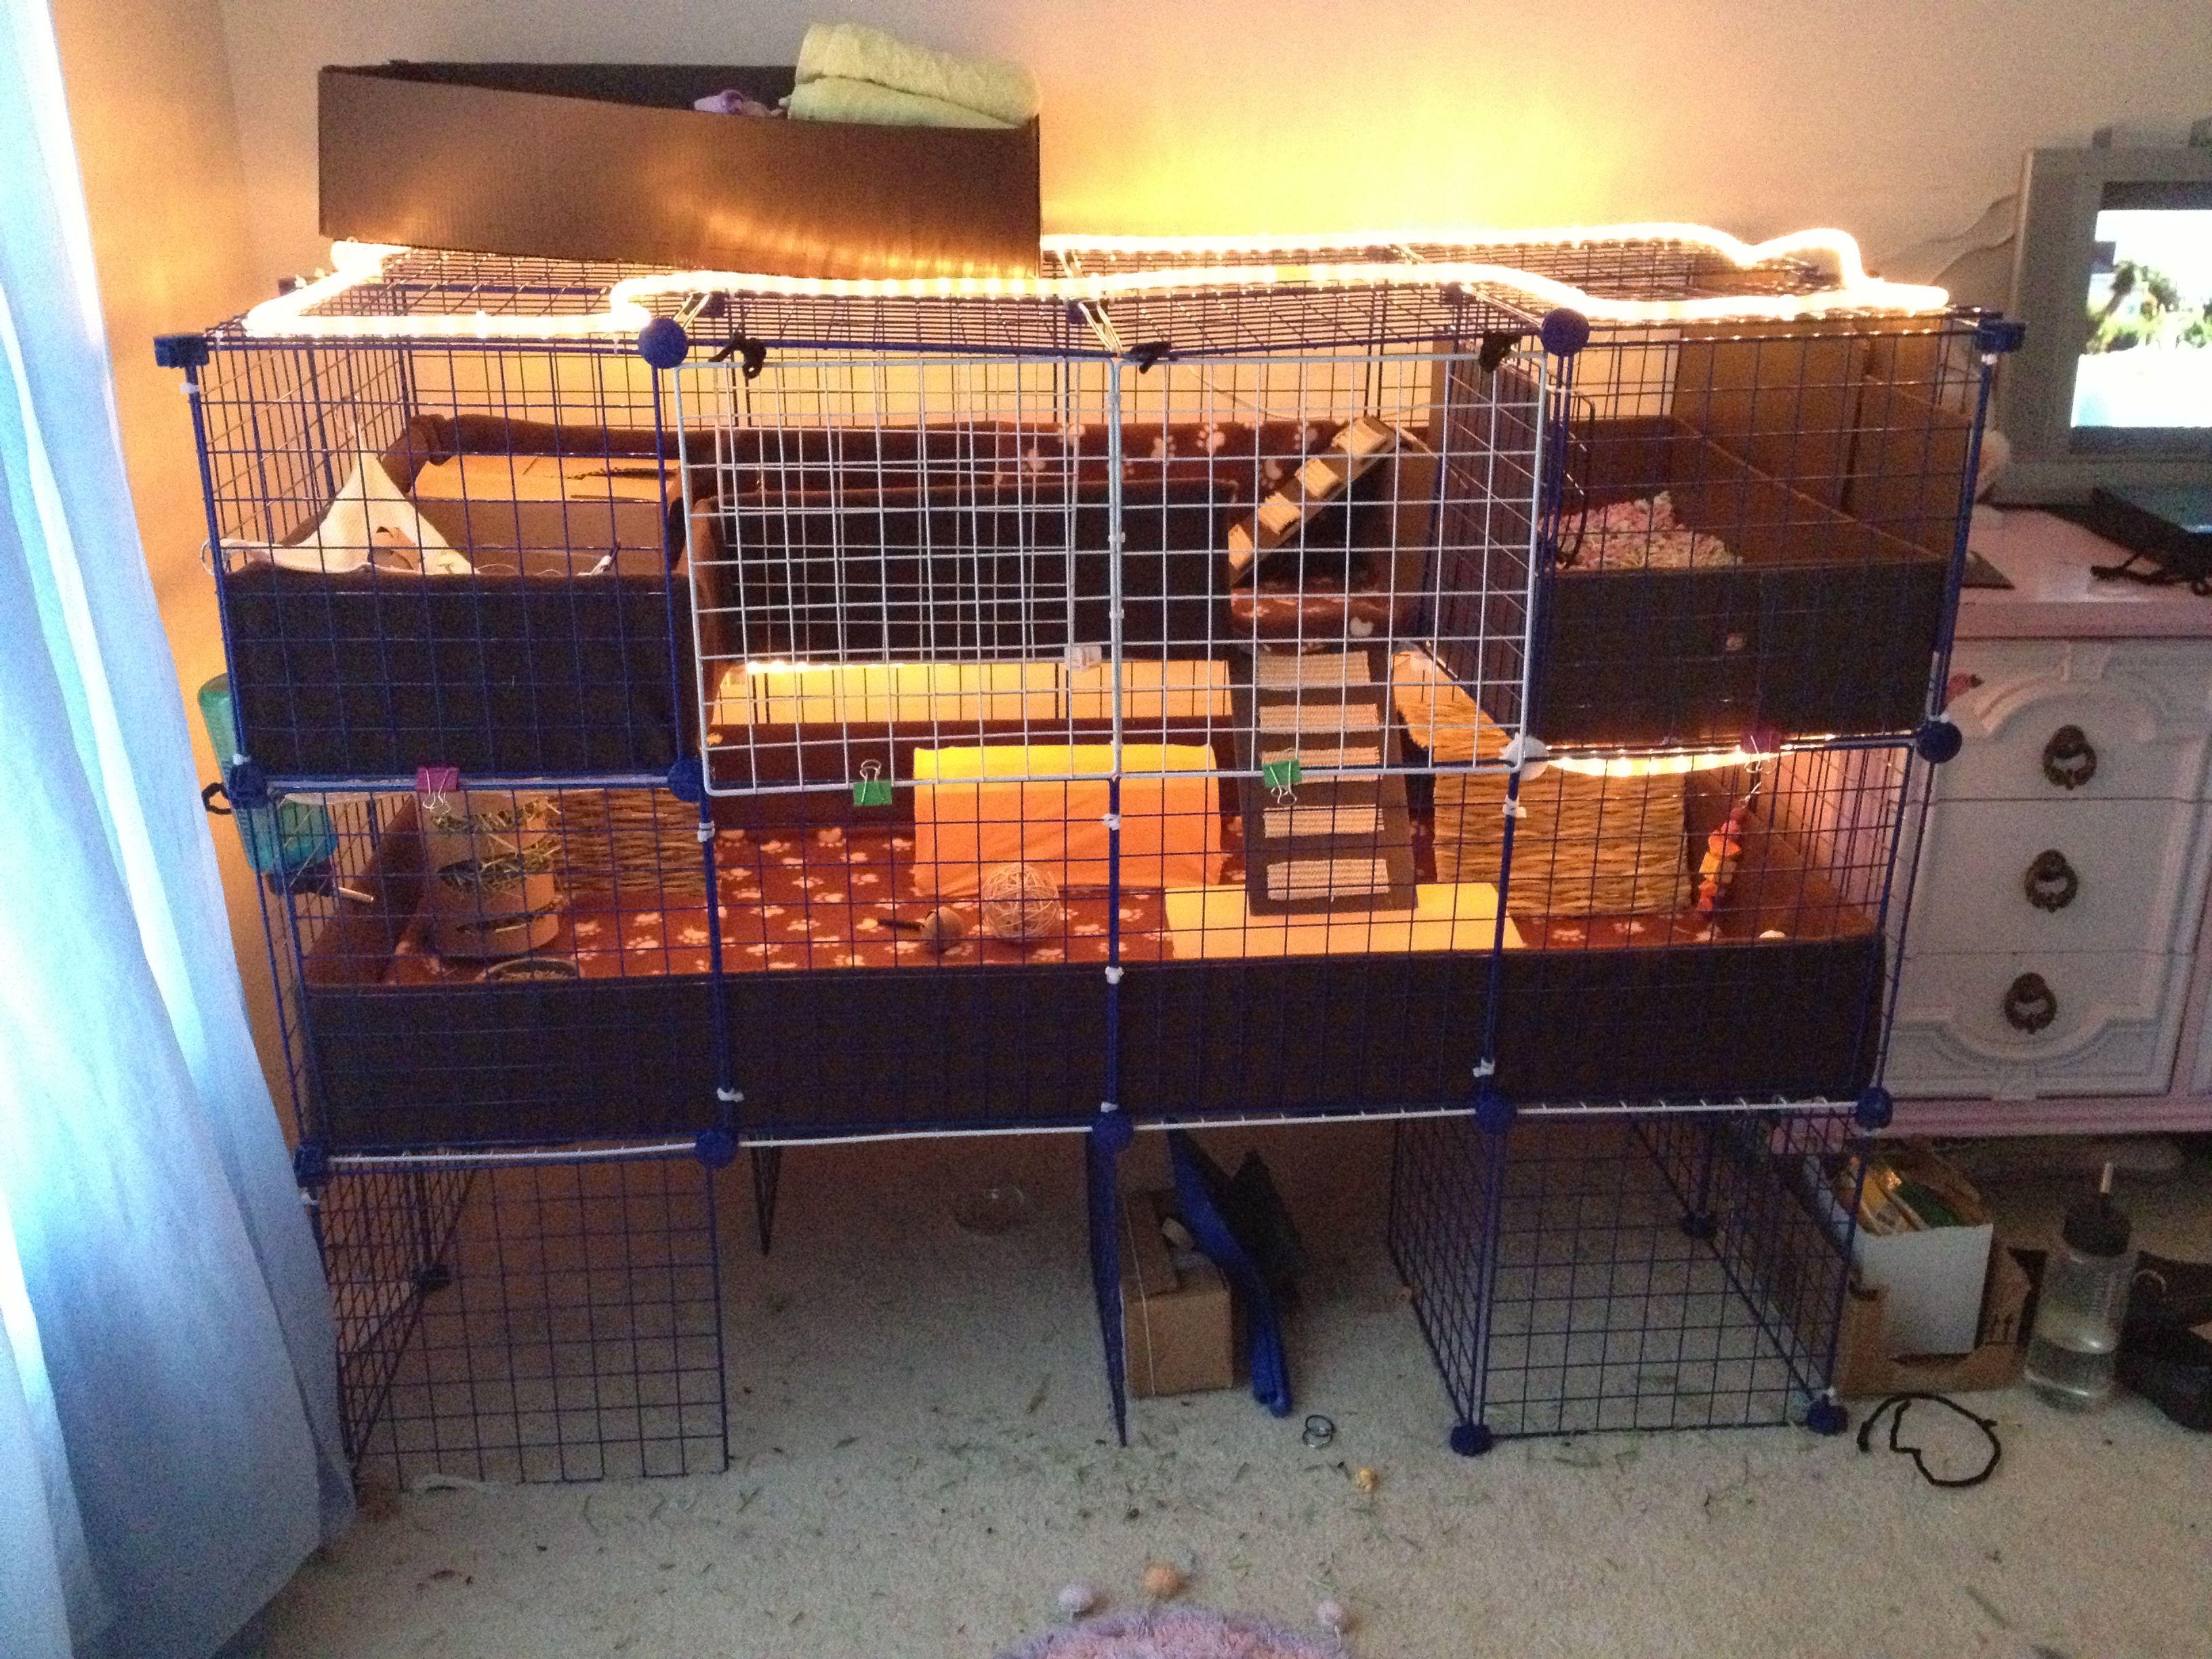 Pin By Karen Sabolcik On Guinea Pig Ideas For Bedding